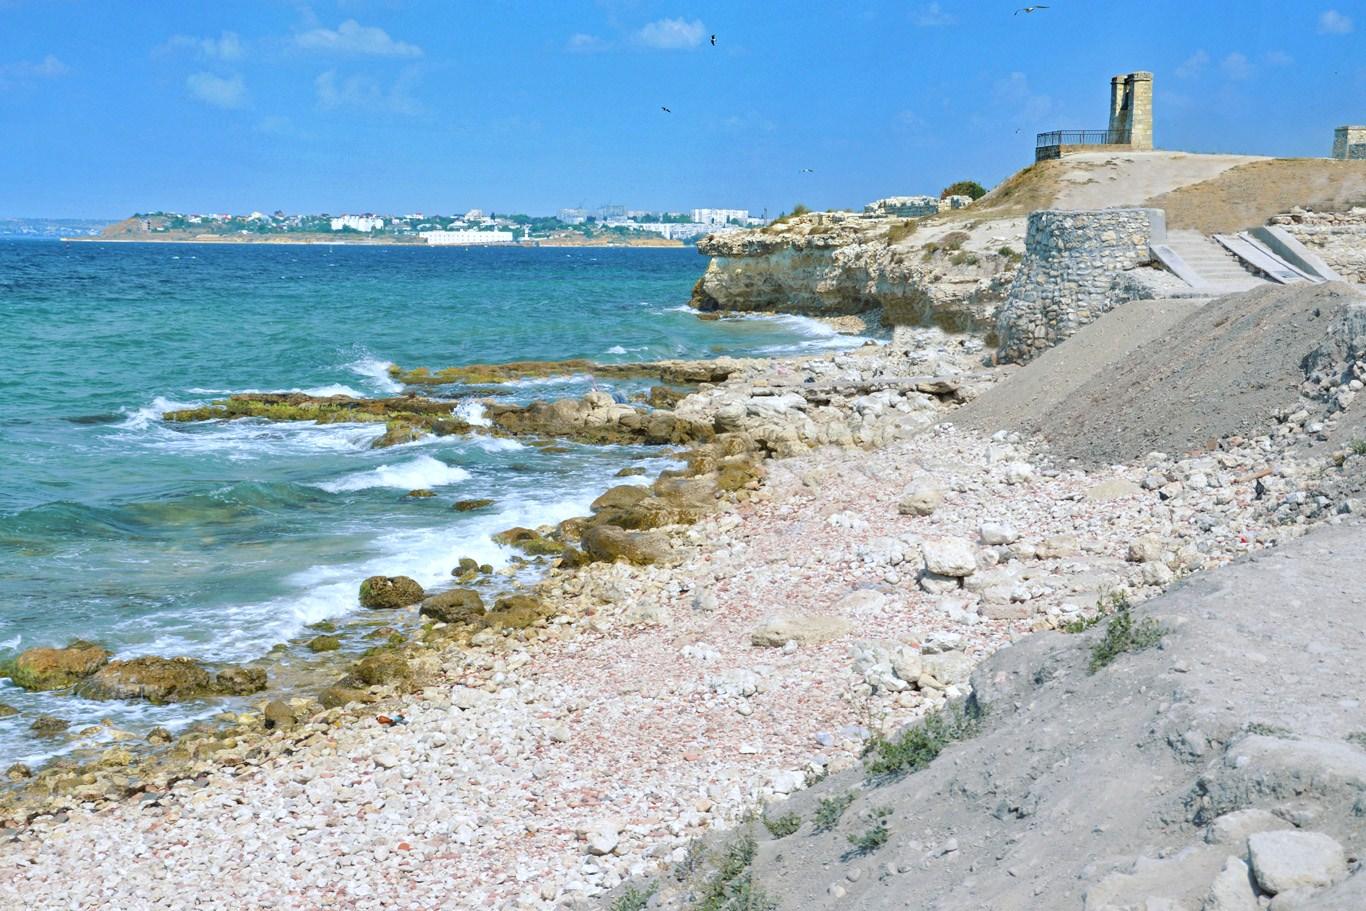 Black Sea at Chersonesus